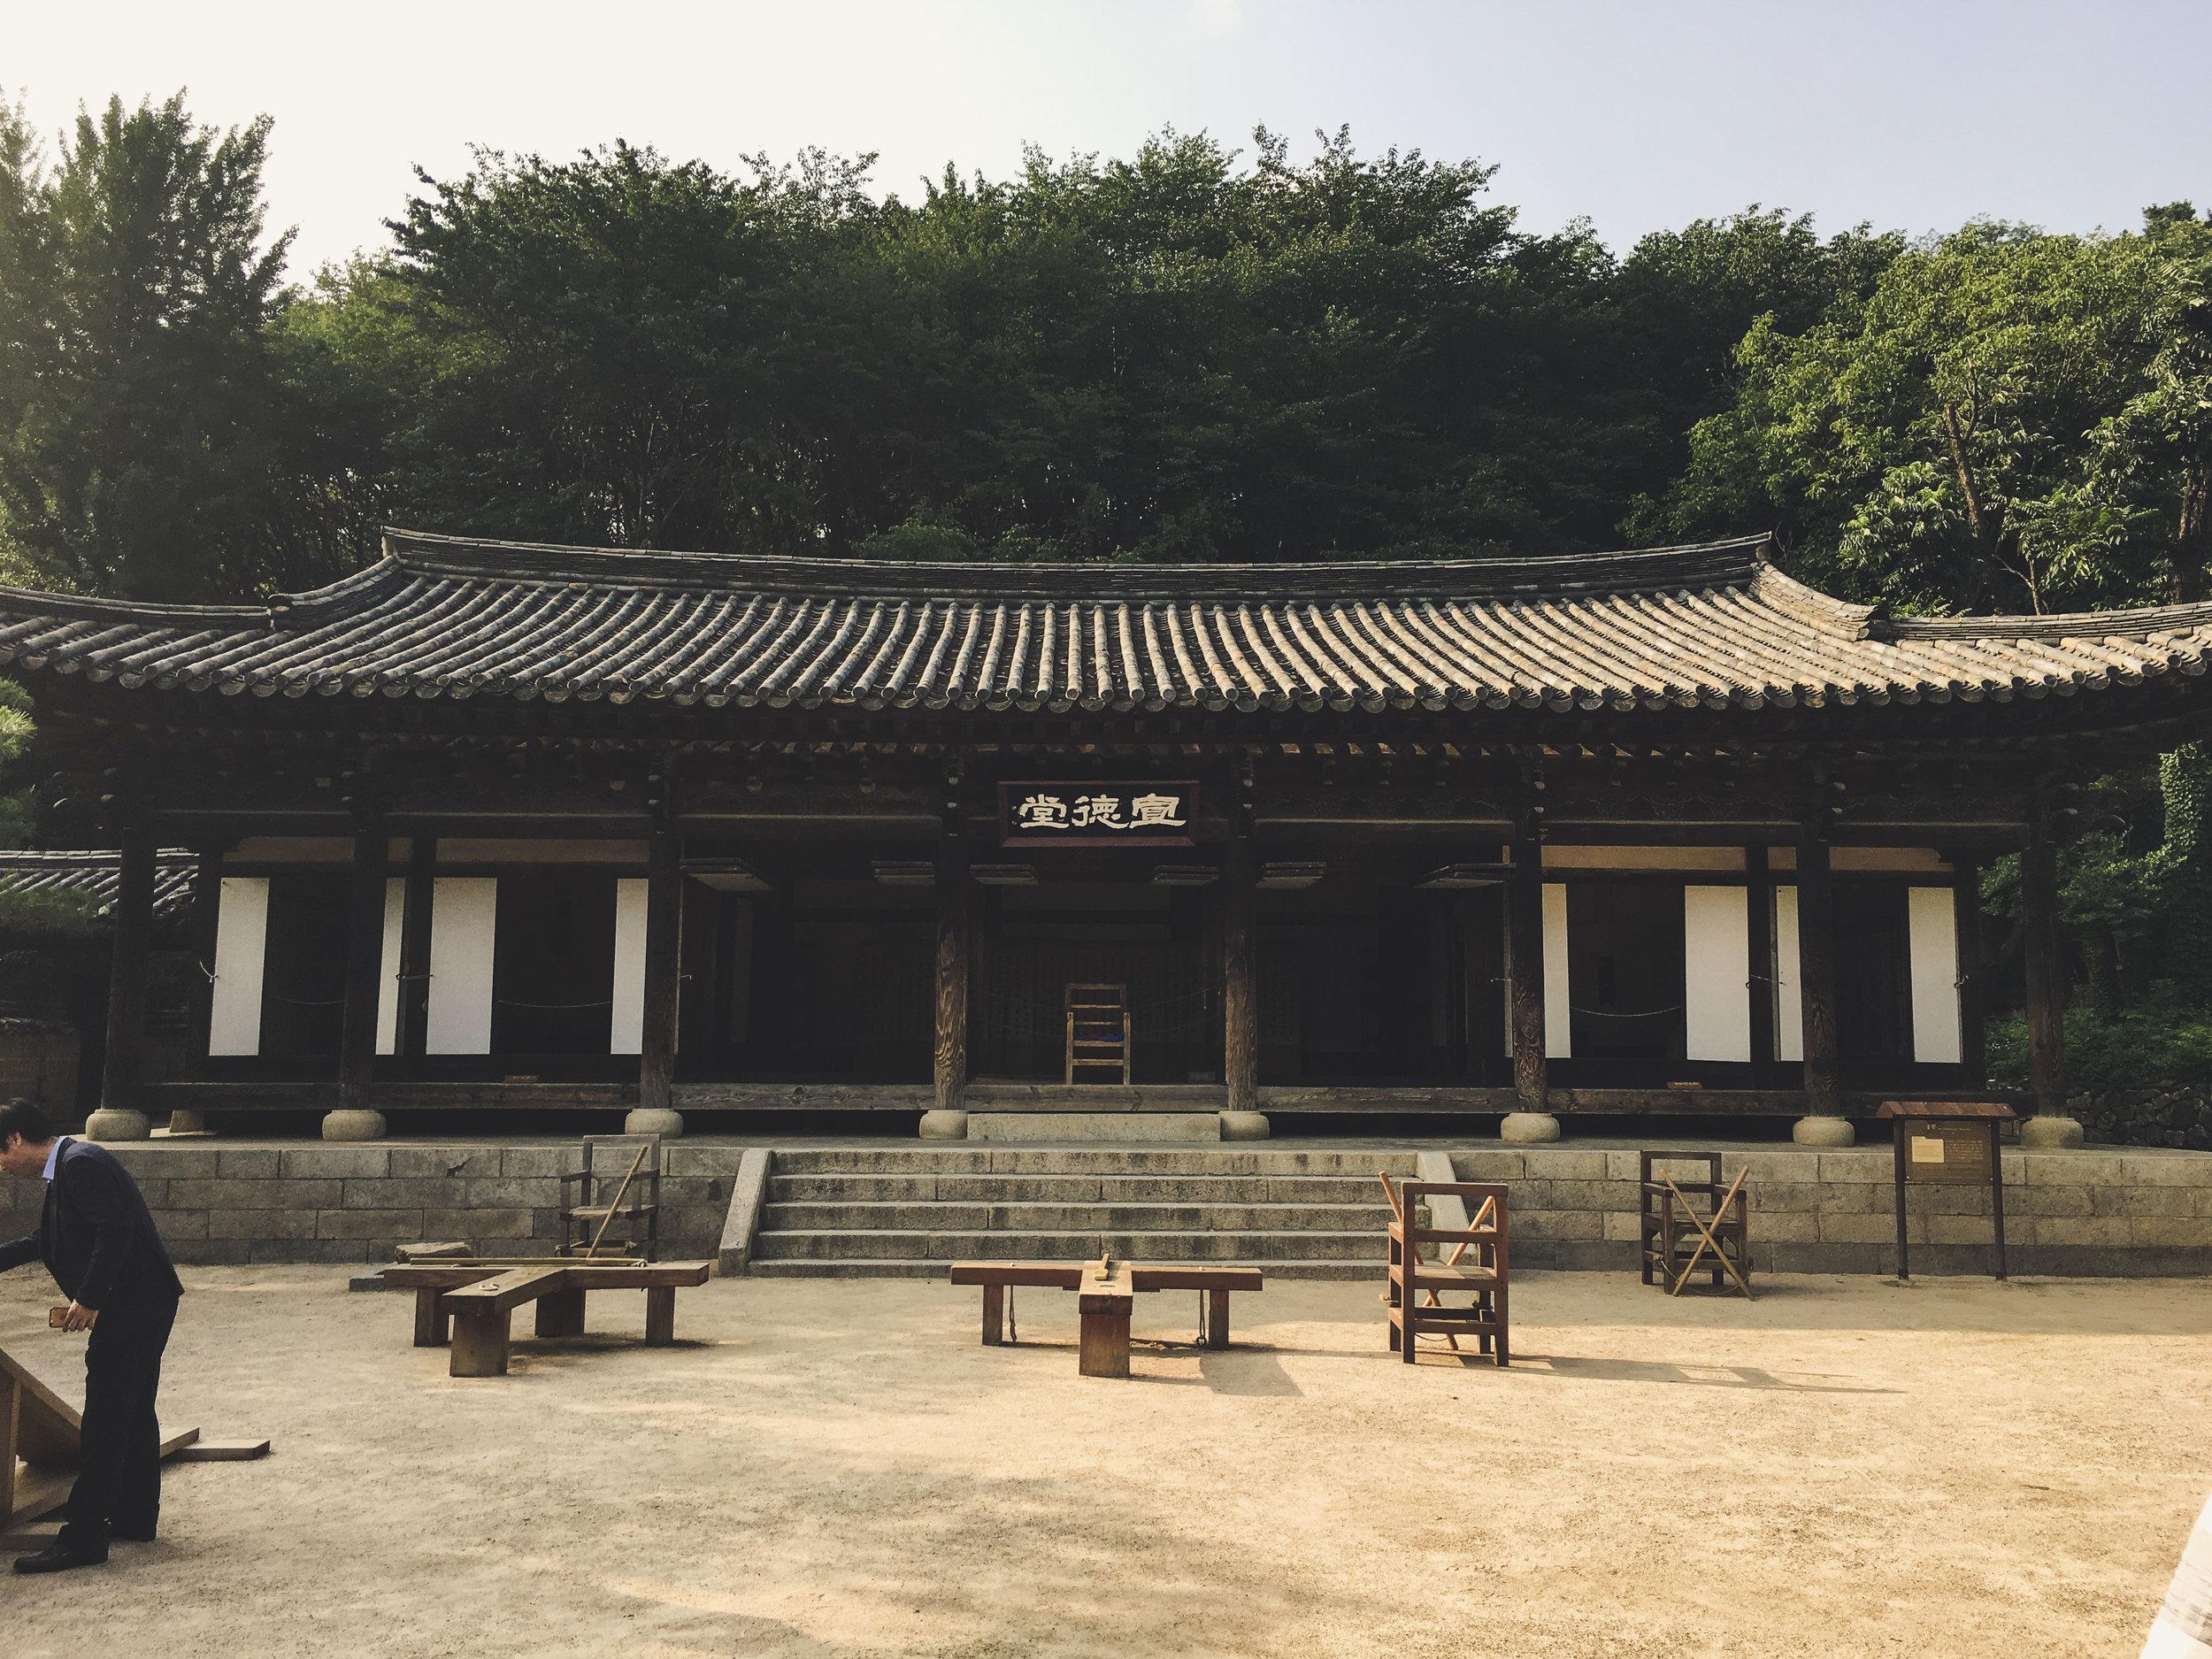 South Korea - Part 1: Seoul and Yongyin